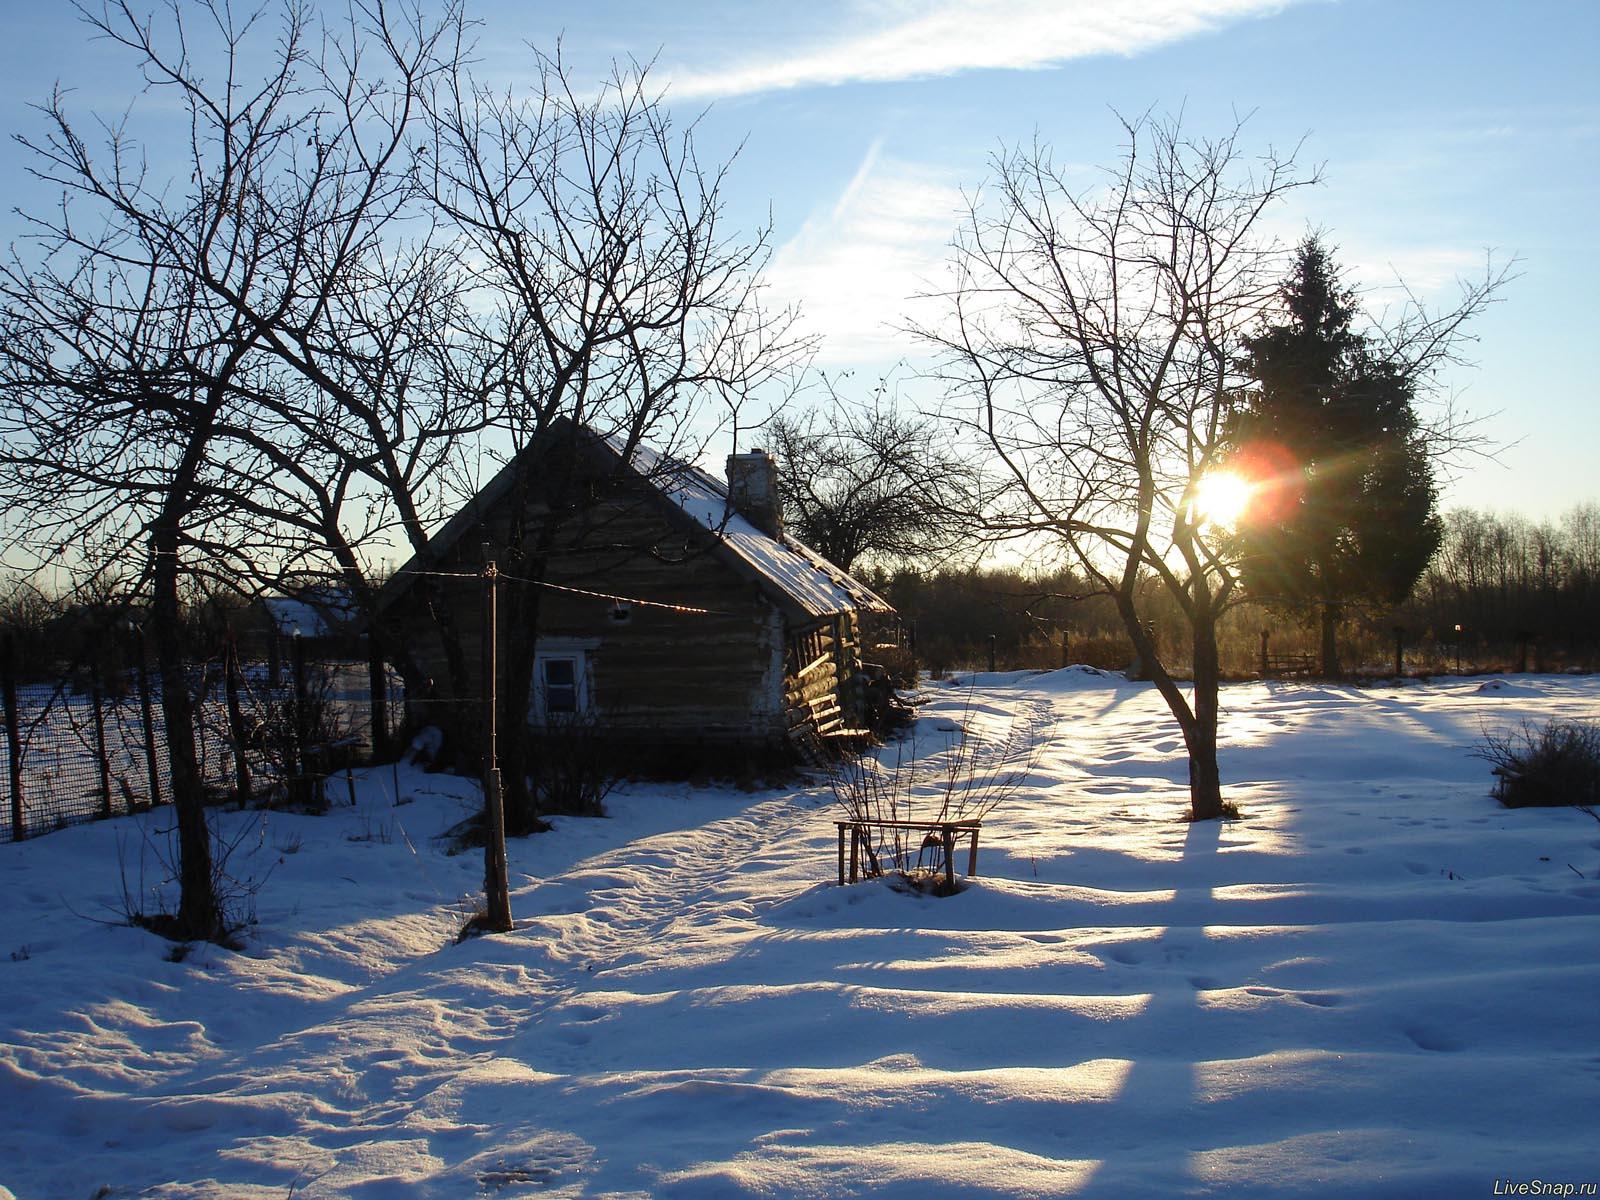 пейзаж с баней  Деревня